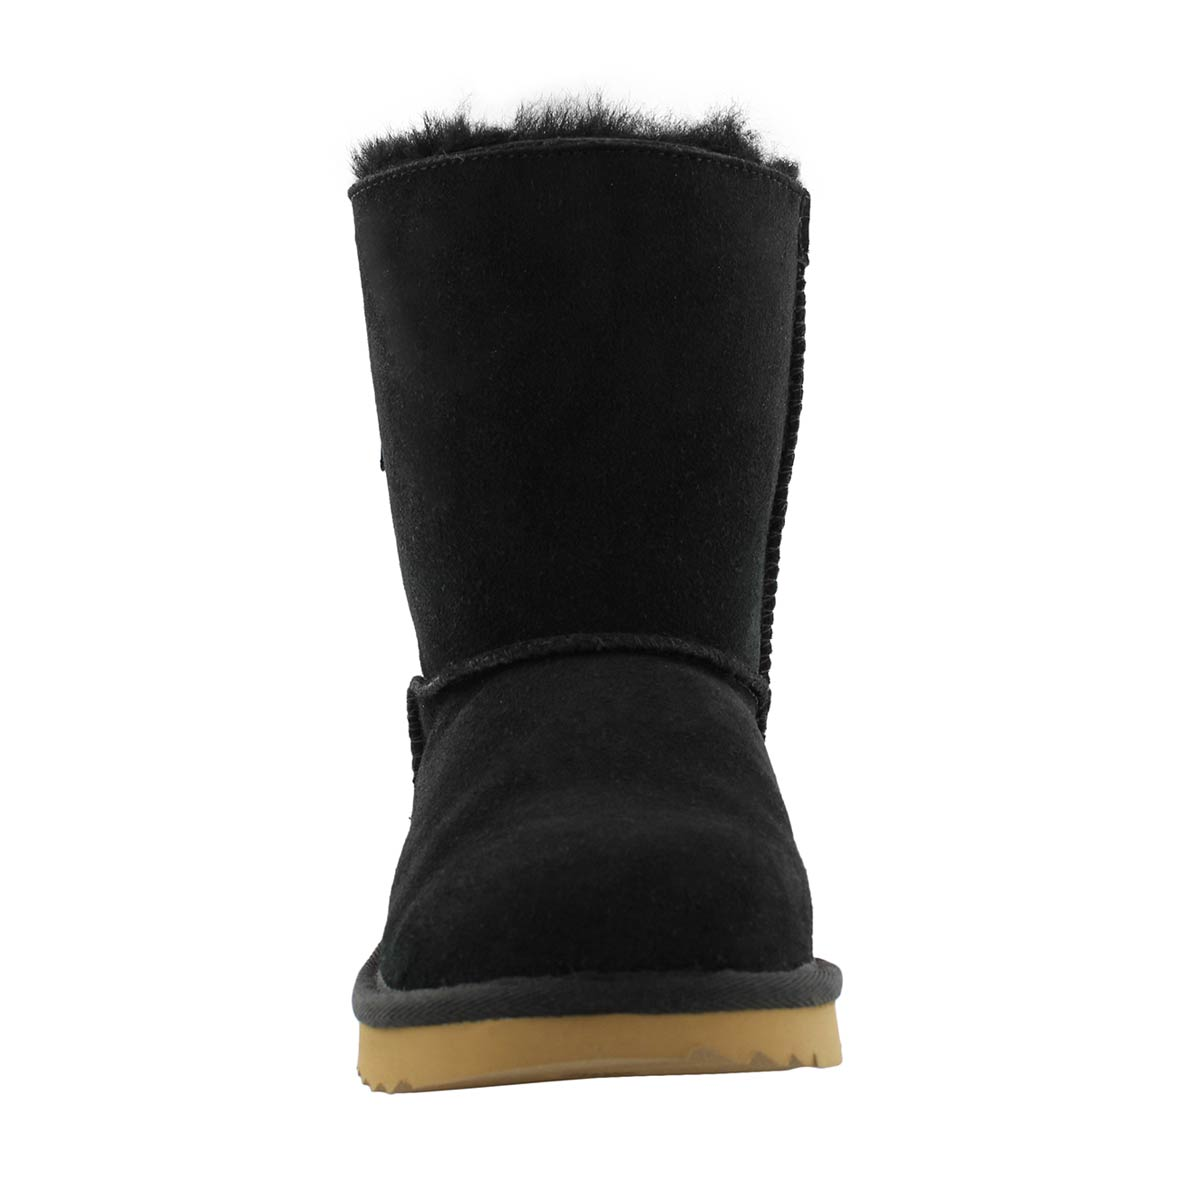 Grls Custom BaileyBow II blk shpskn boot